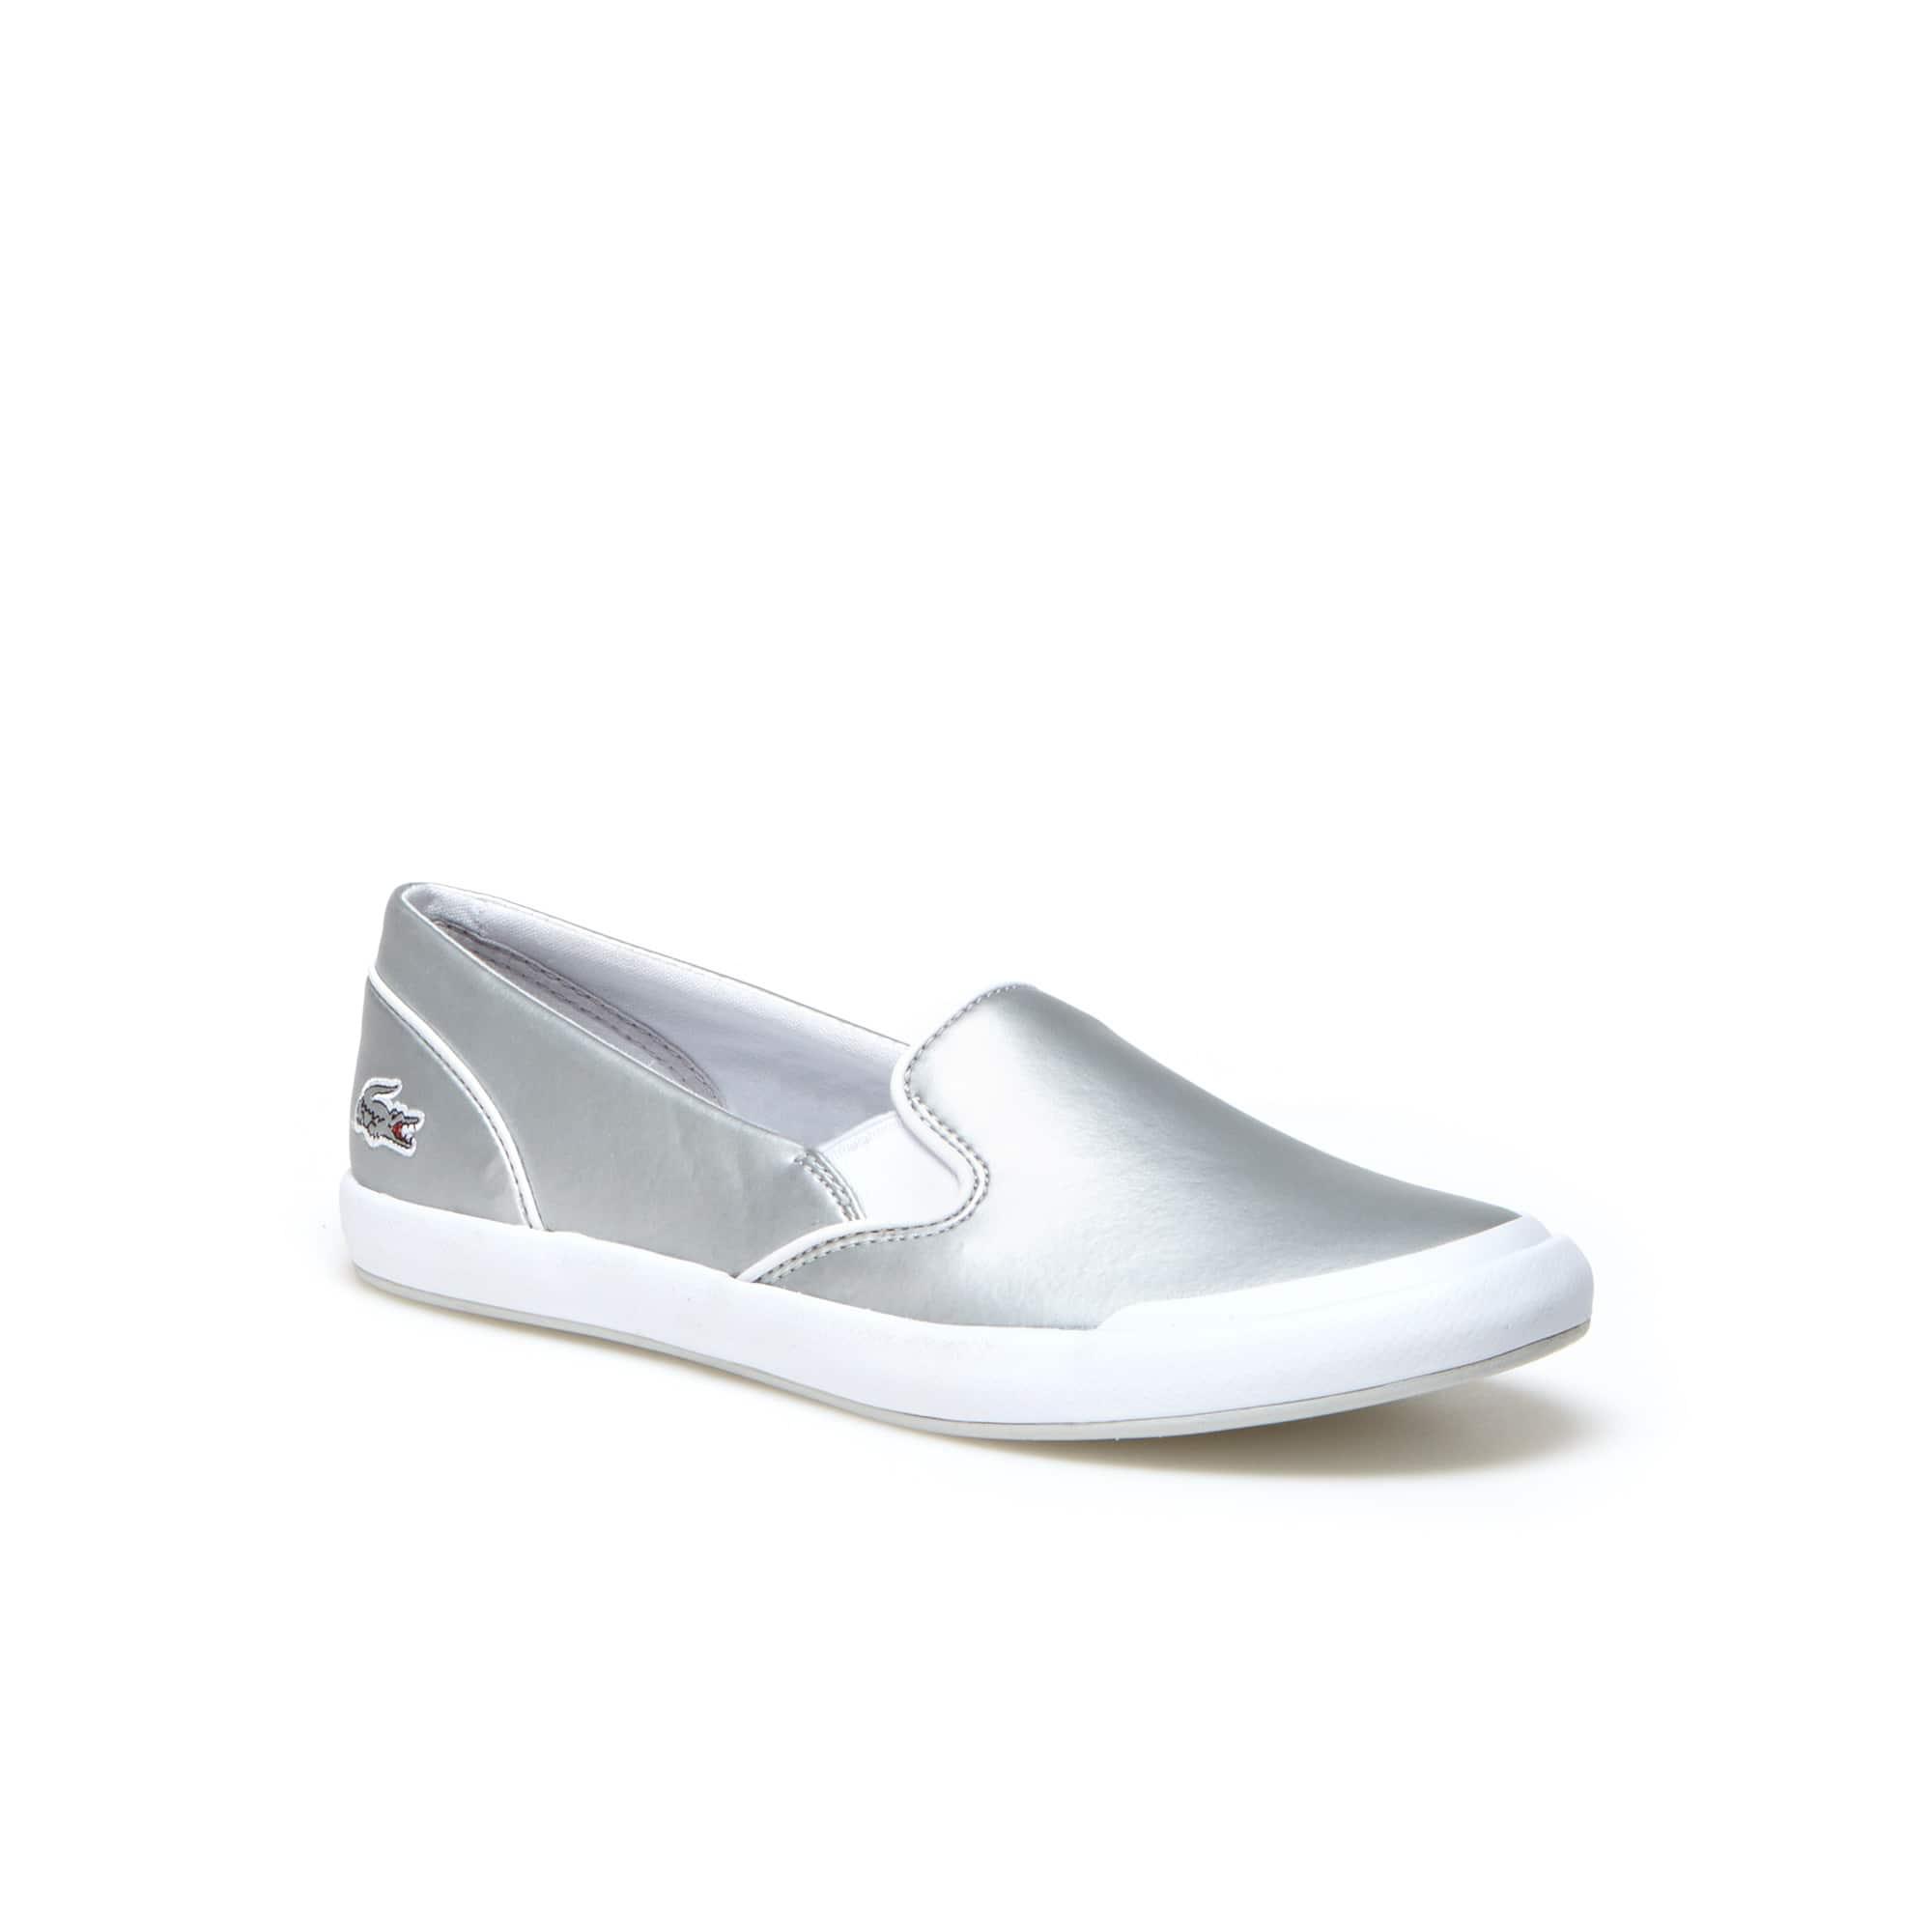 Sneakers senza stringhe Lancelle in pelle